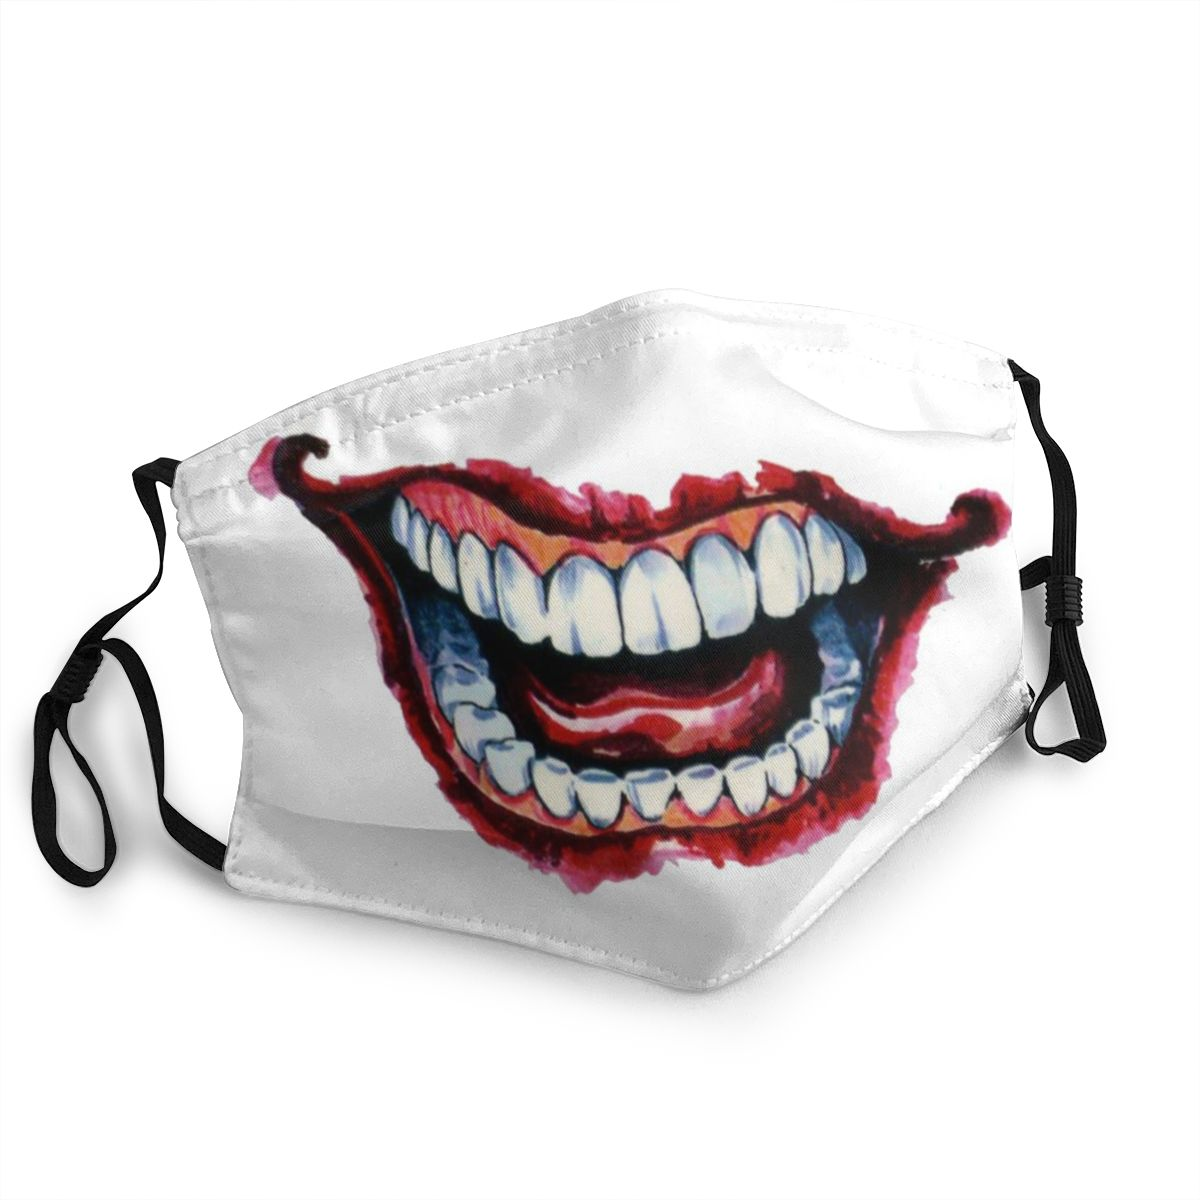 2020 3d Print Lego Joker Face Pm2.5 Filter Mouth Masks Joker Teeth Muffle Chanyeol Face Anti Custom Mouth Mask